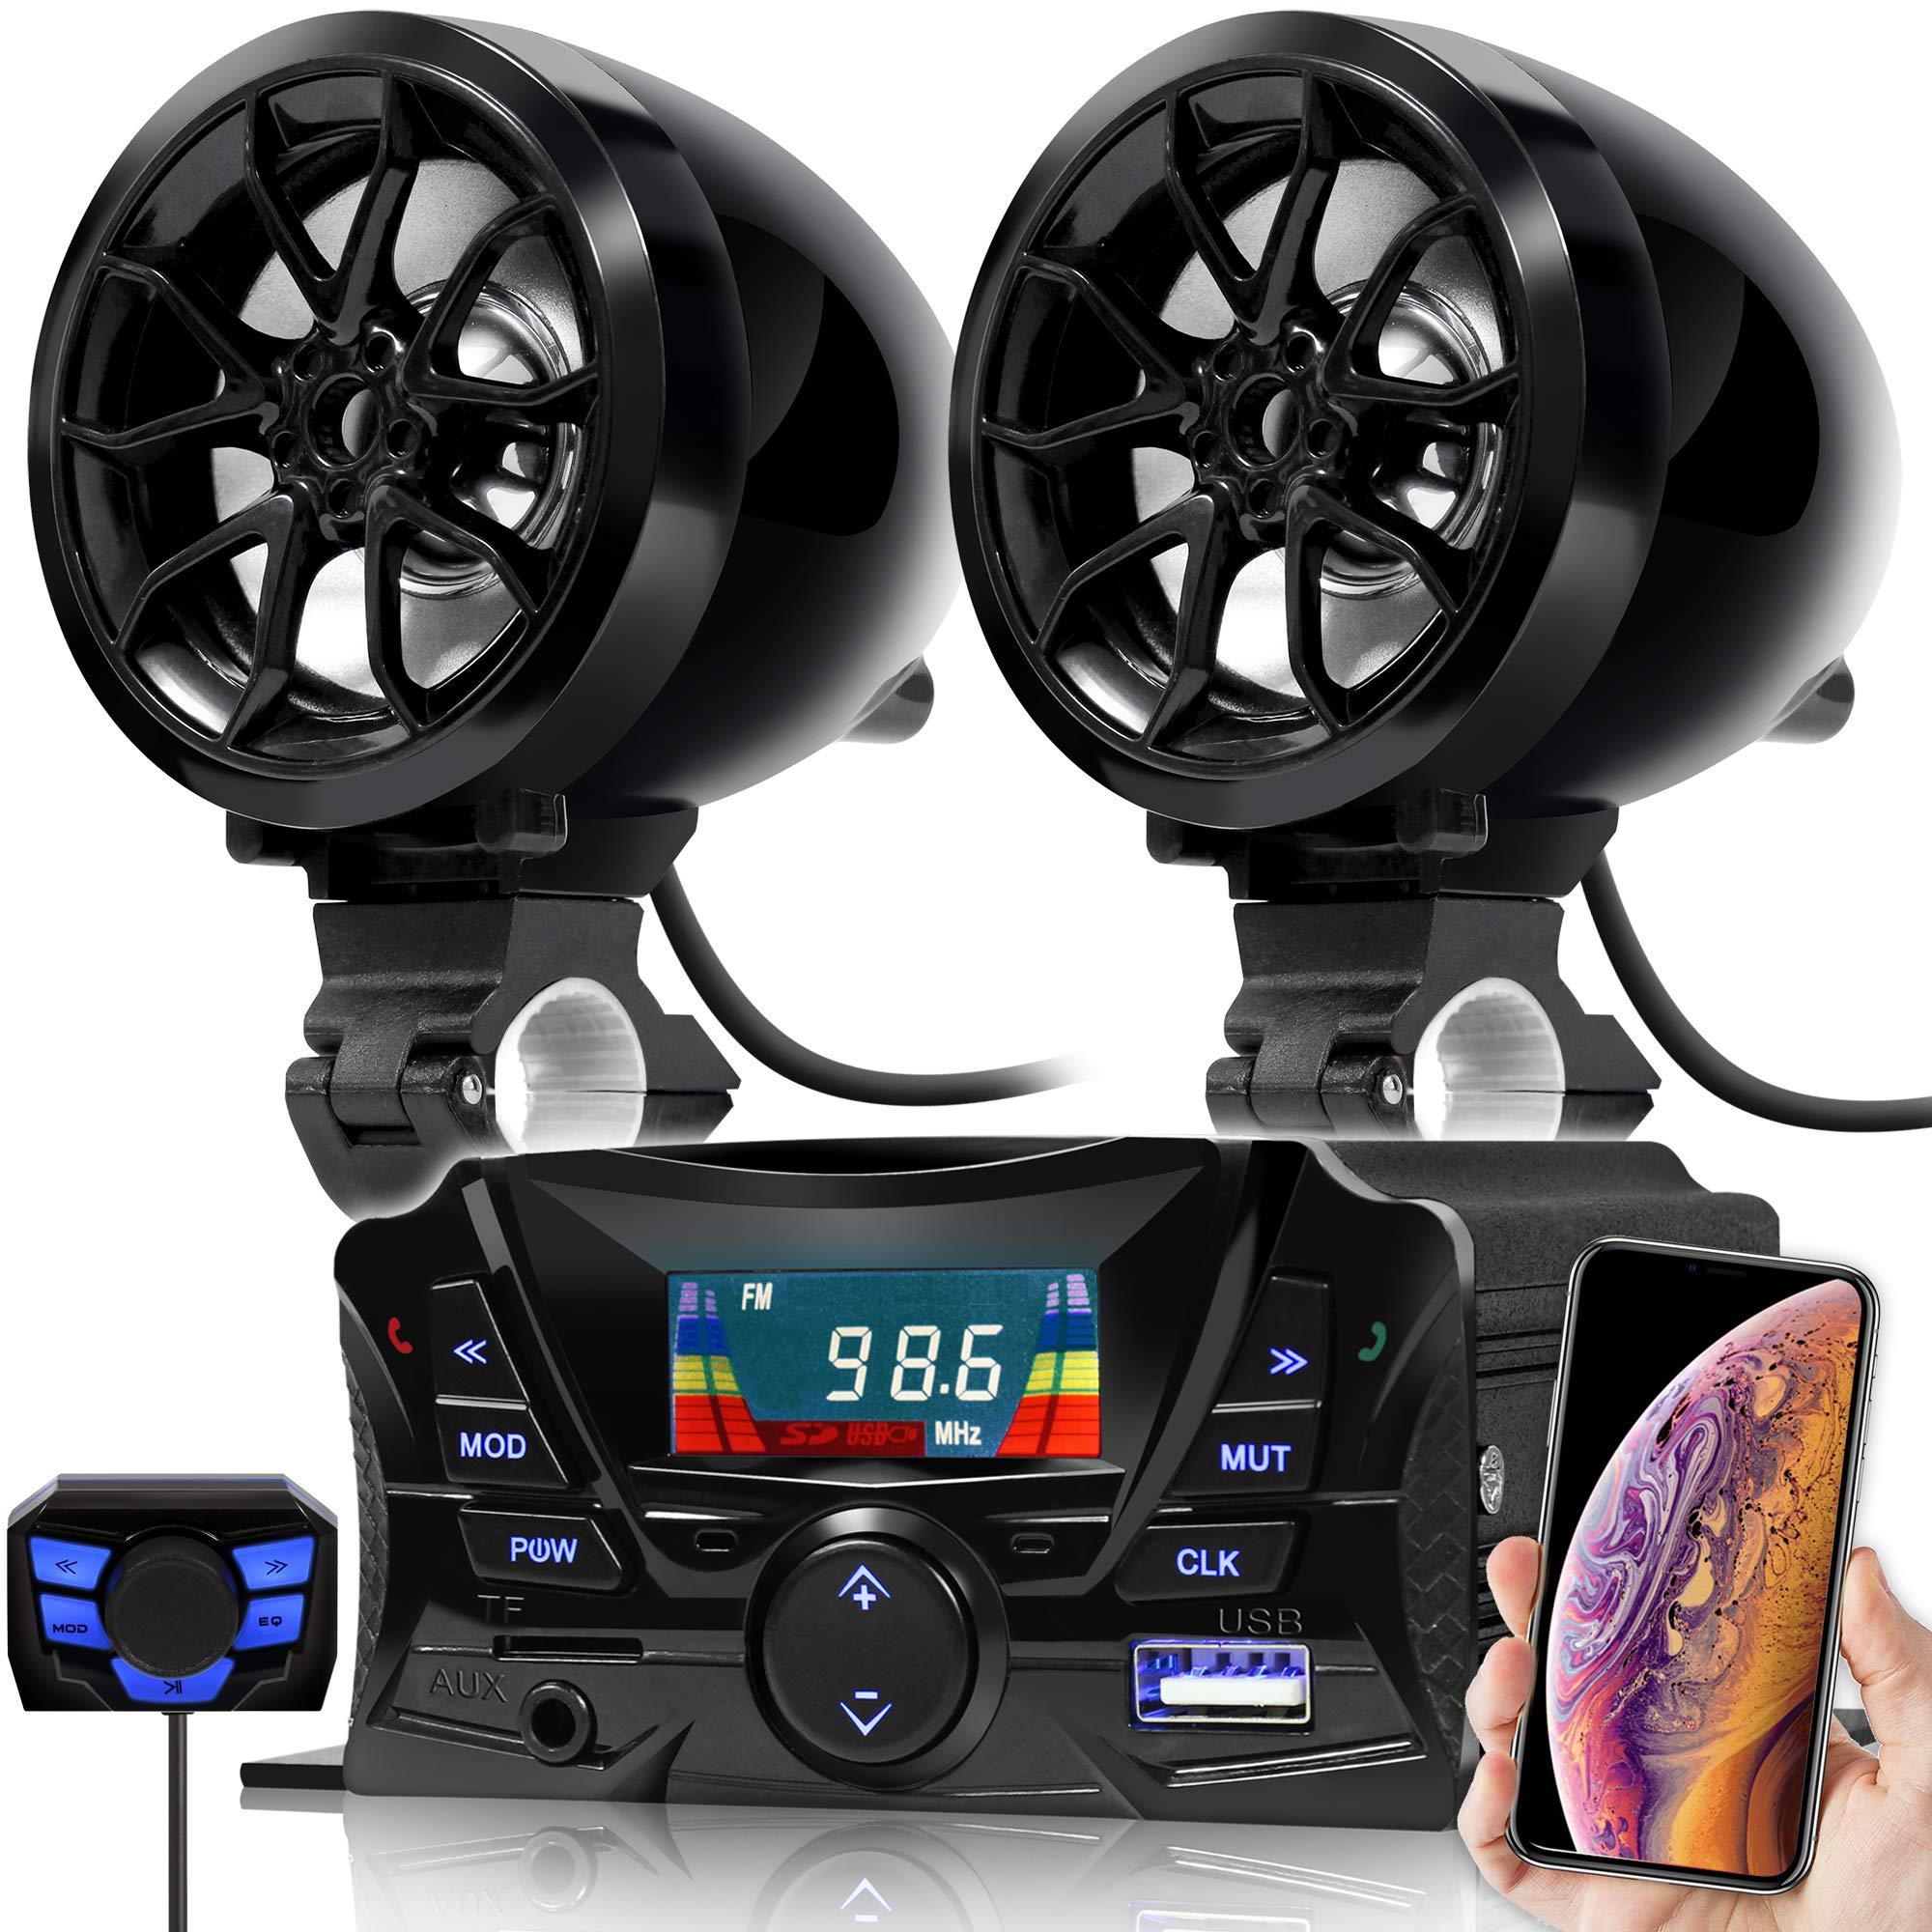 GoHawk TS3 Gen.2 Motorcycle 3'' Waterproof Bluetooth Speaker 7/8-1 in. Handlebar Mount MP3 Music Player Audio Stereo Amplifier System ATV UTV w/AUX in, USB, Micro SD, FM Radio (TS3 Black) by GoHawk